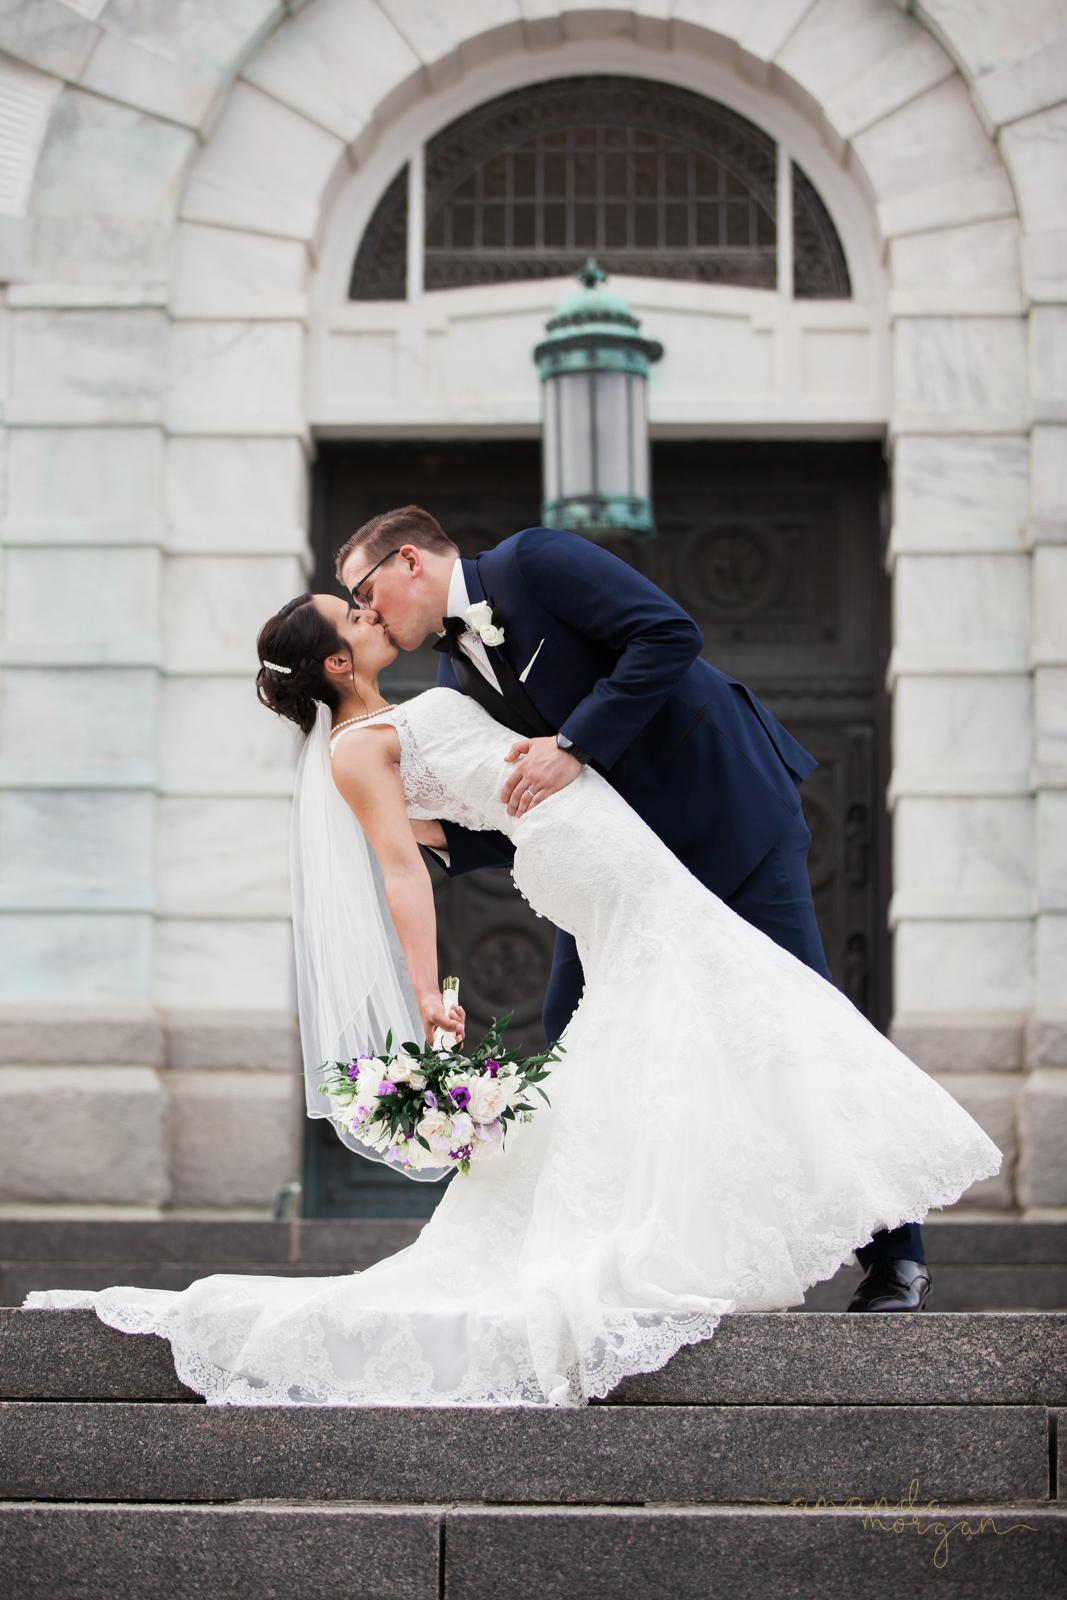 Notre-Dame-Catholic-Church-Wedding-Amanda-Morgan-23.jpg